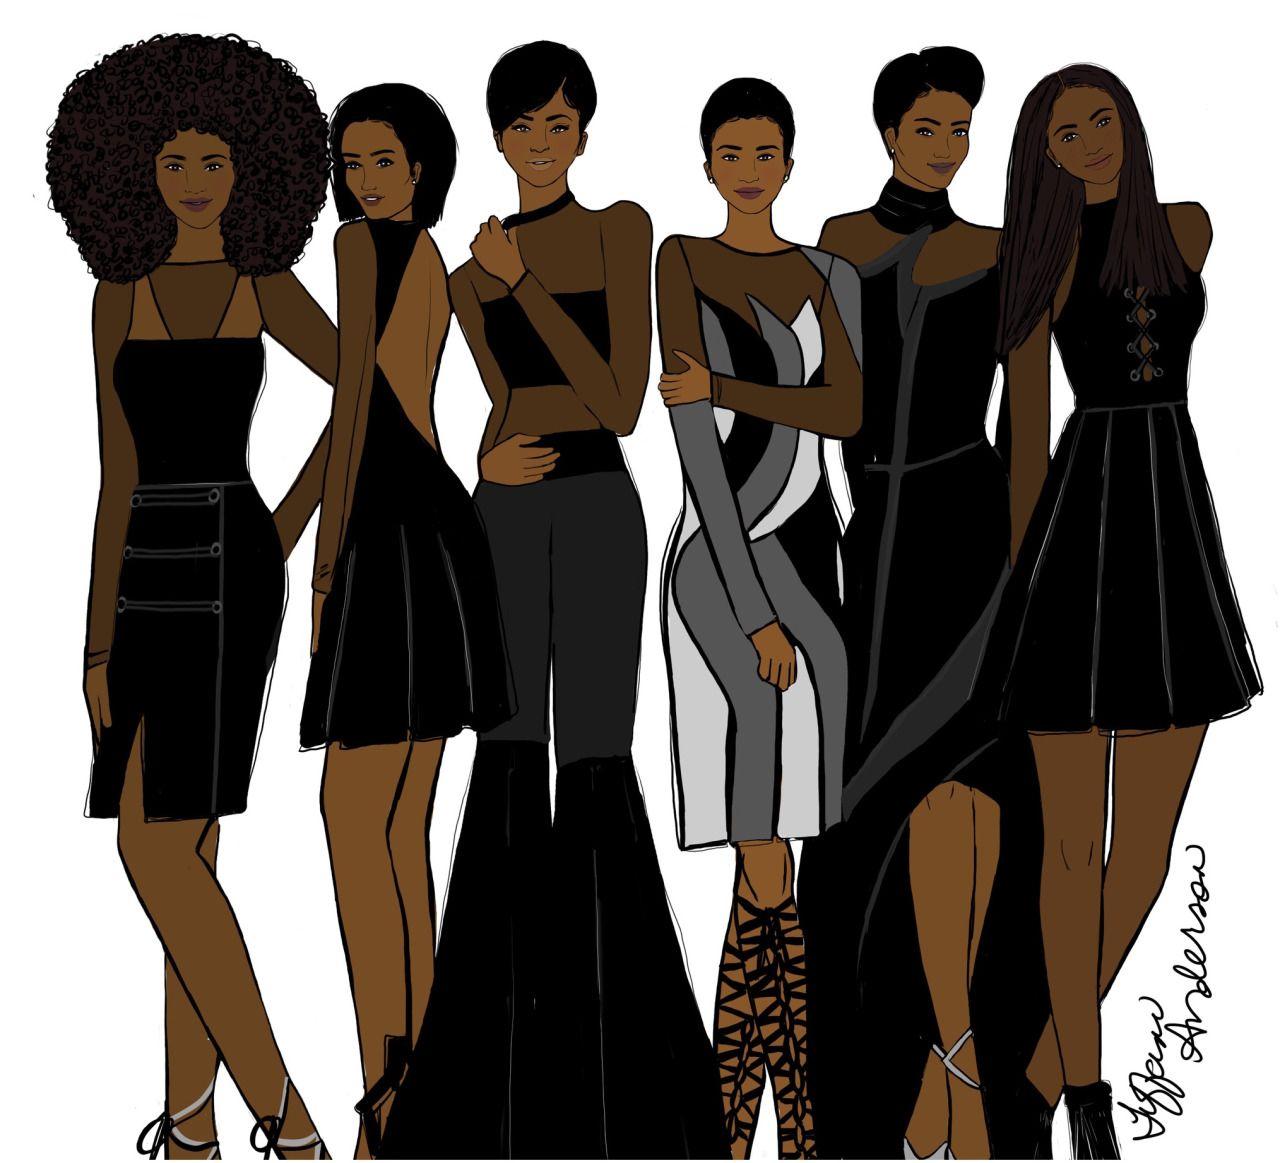 African American Girls Fashion: Black Beauty - Tiffani Anderson Illustration